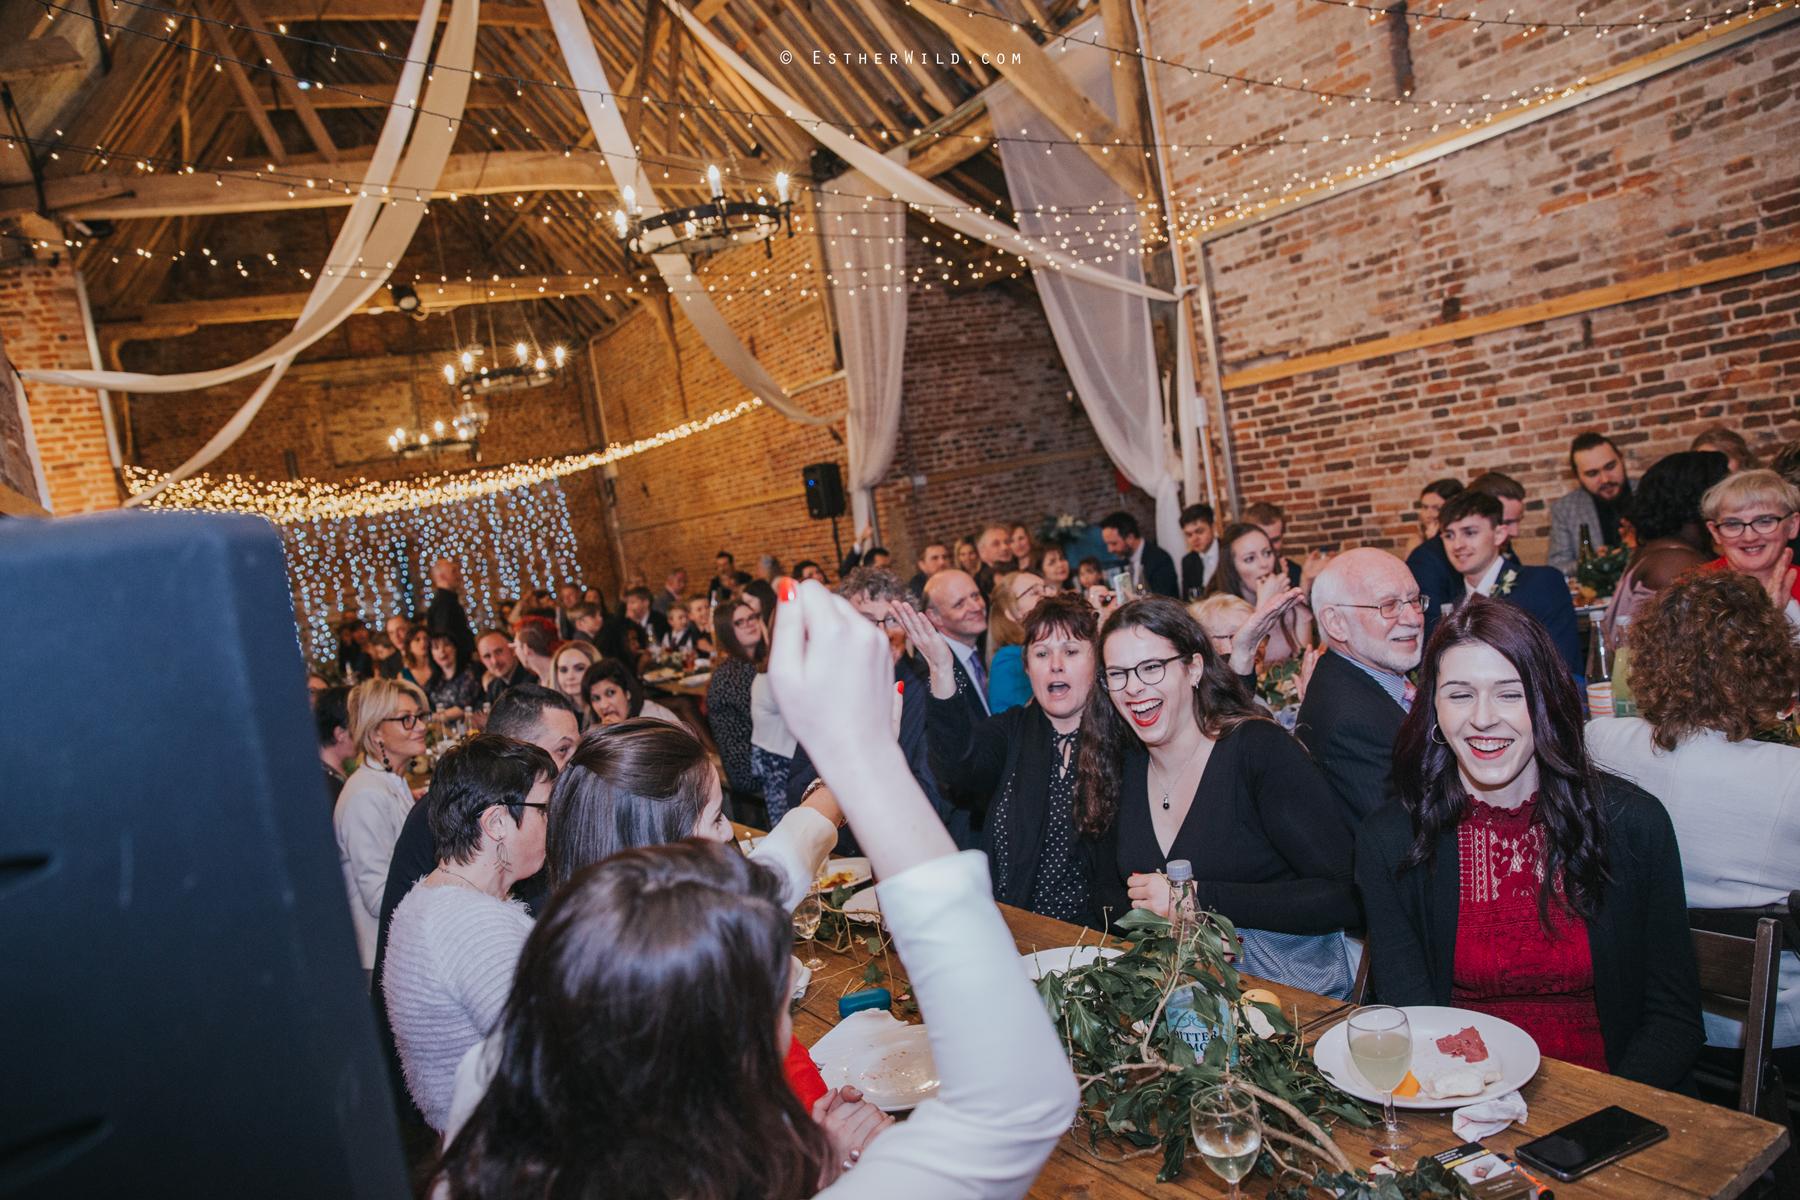 Glebe_Farm_Barn_Rustic_Norfolk_Wedding_Esther_Wild_Photographer_Copyright_IMG_2318.jpg